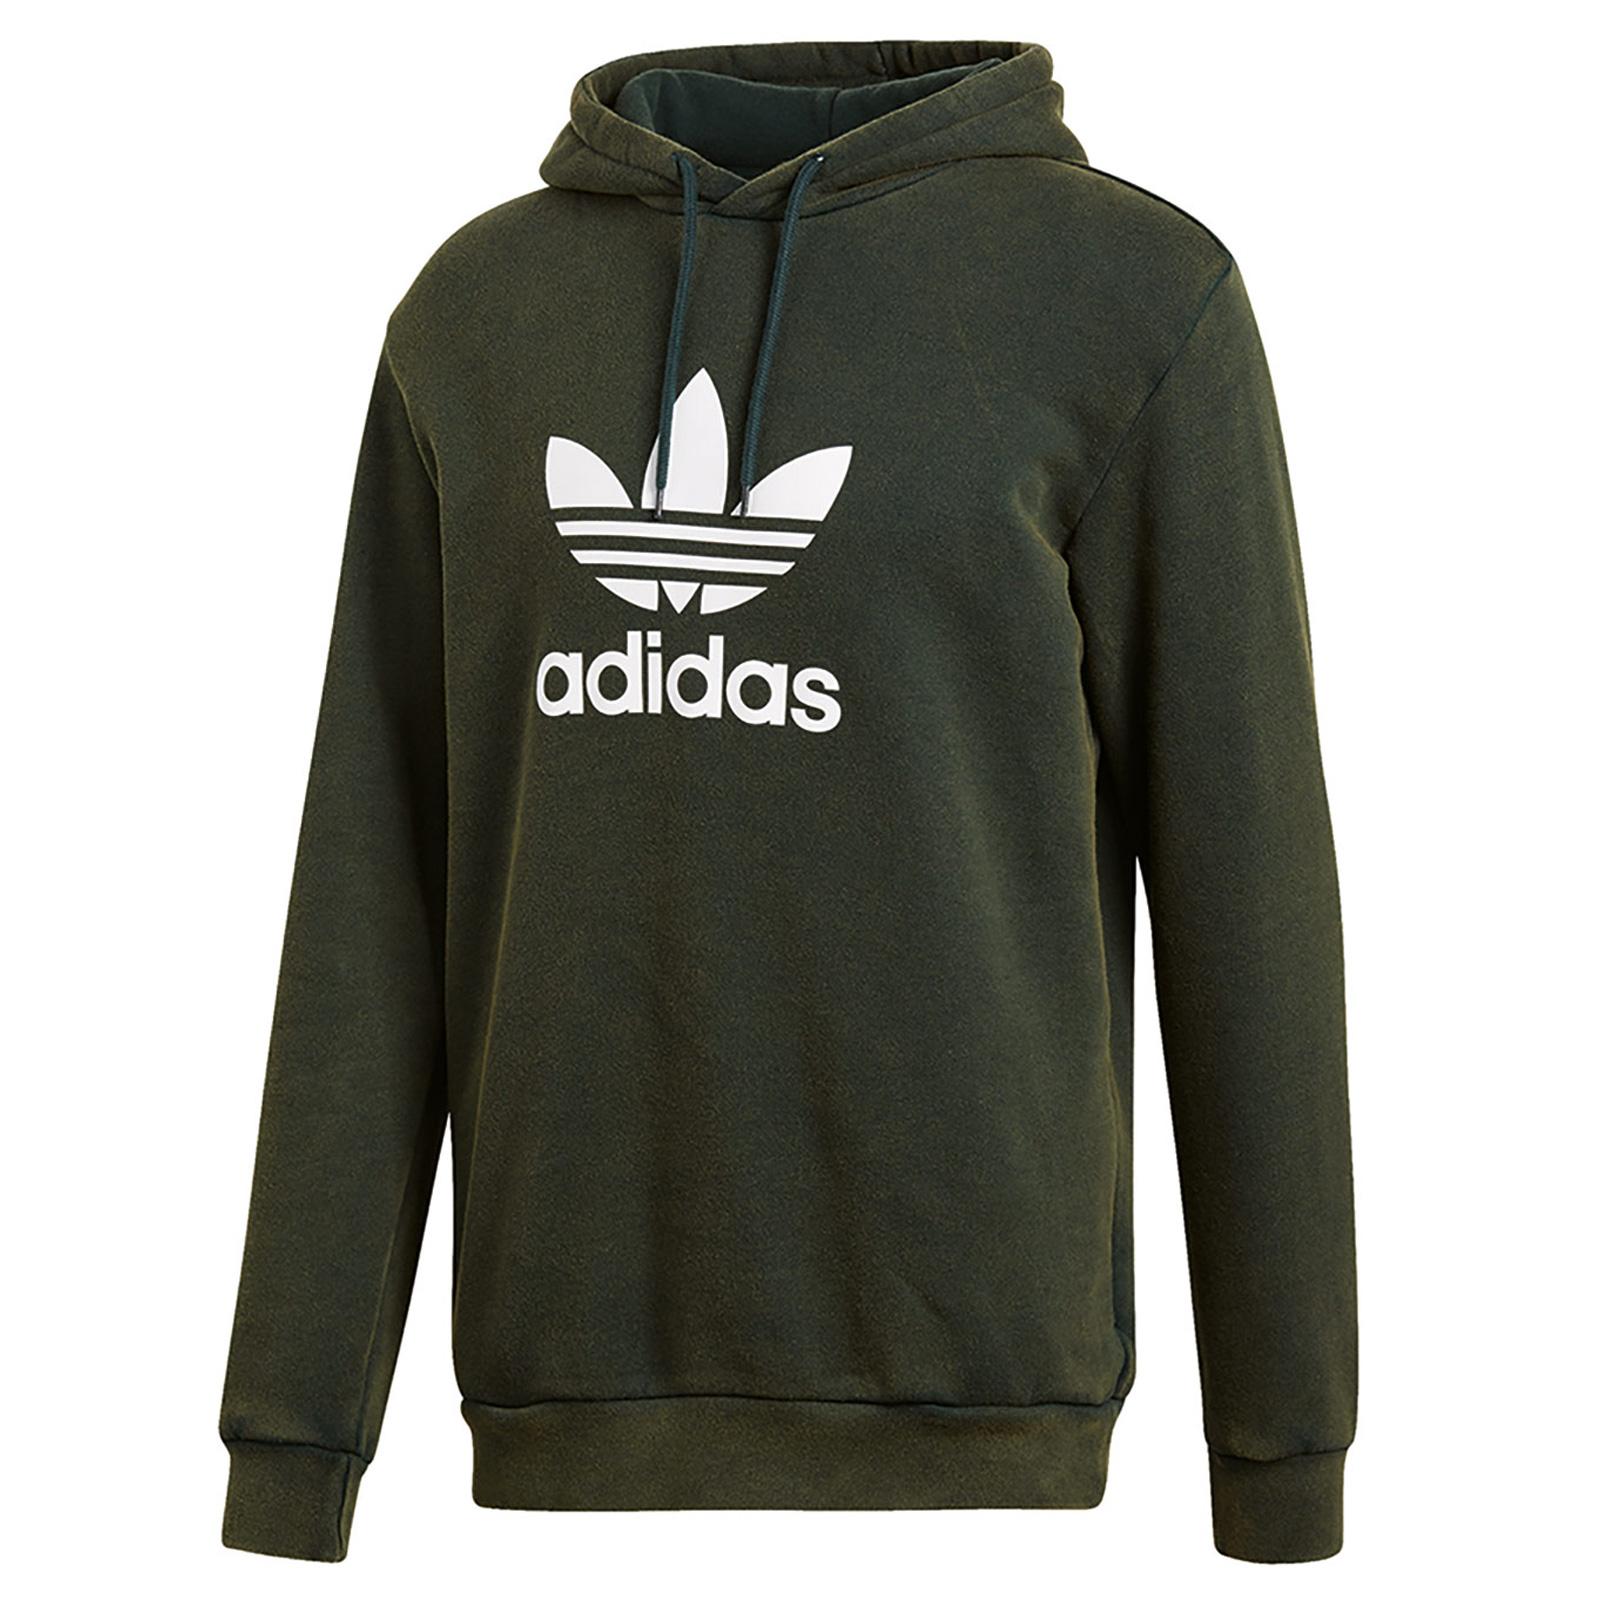 Details about Adidas Originals Adi Trefoil Hooded Sweater Jumper Sweatshirt Hoody Dark Green